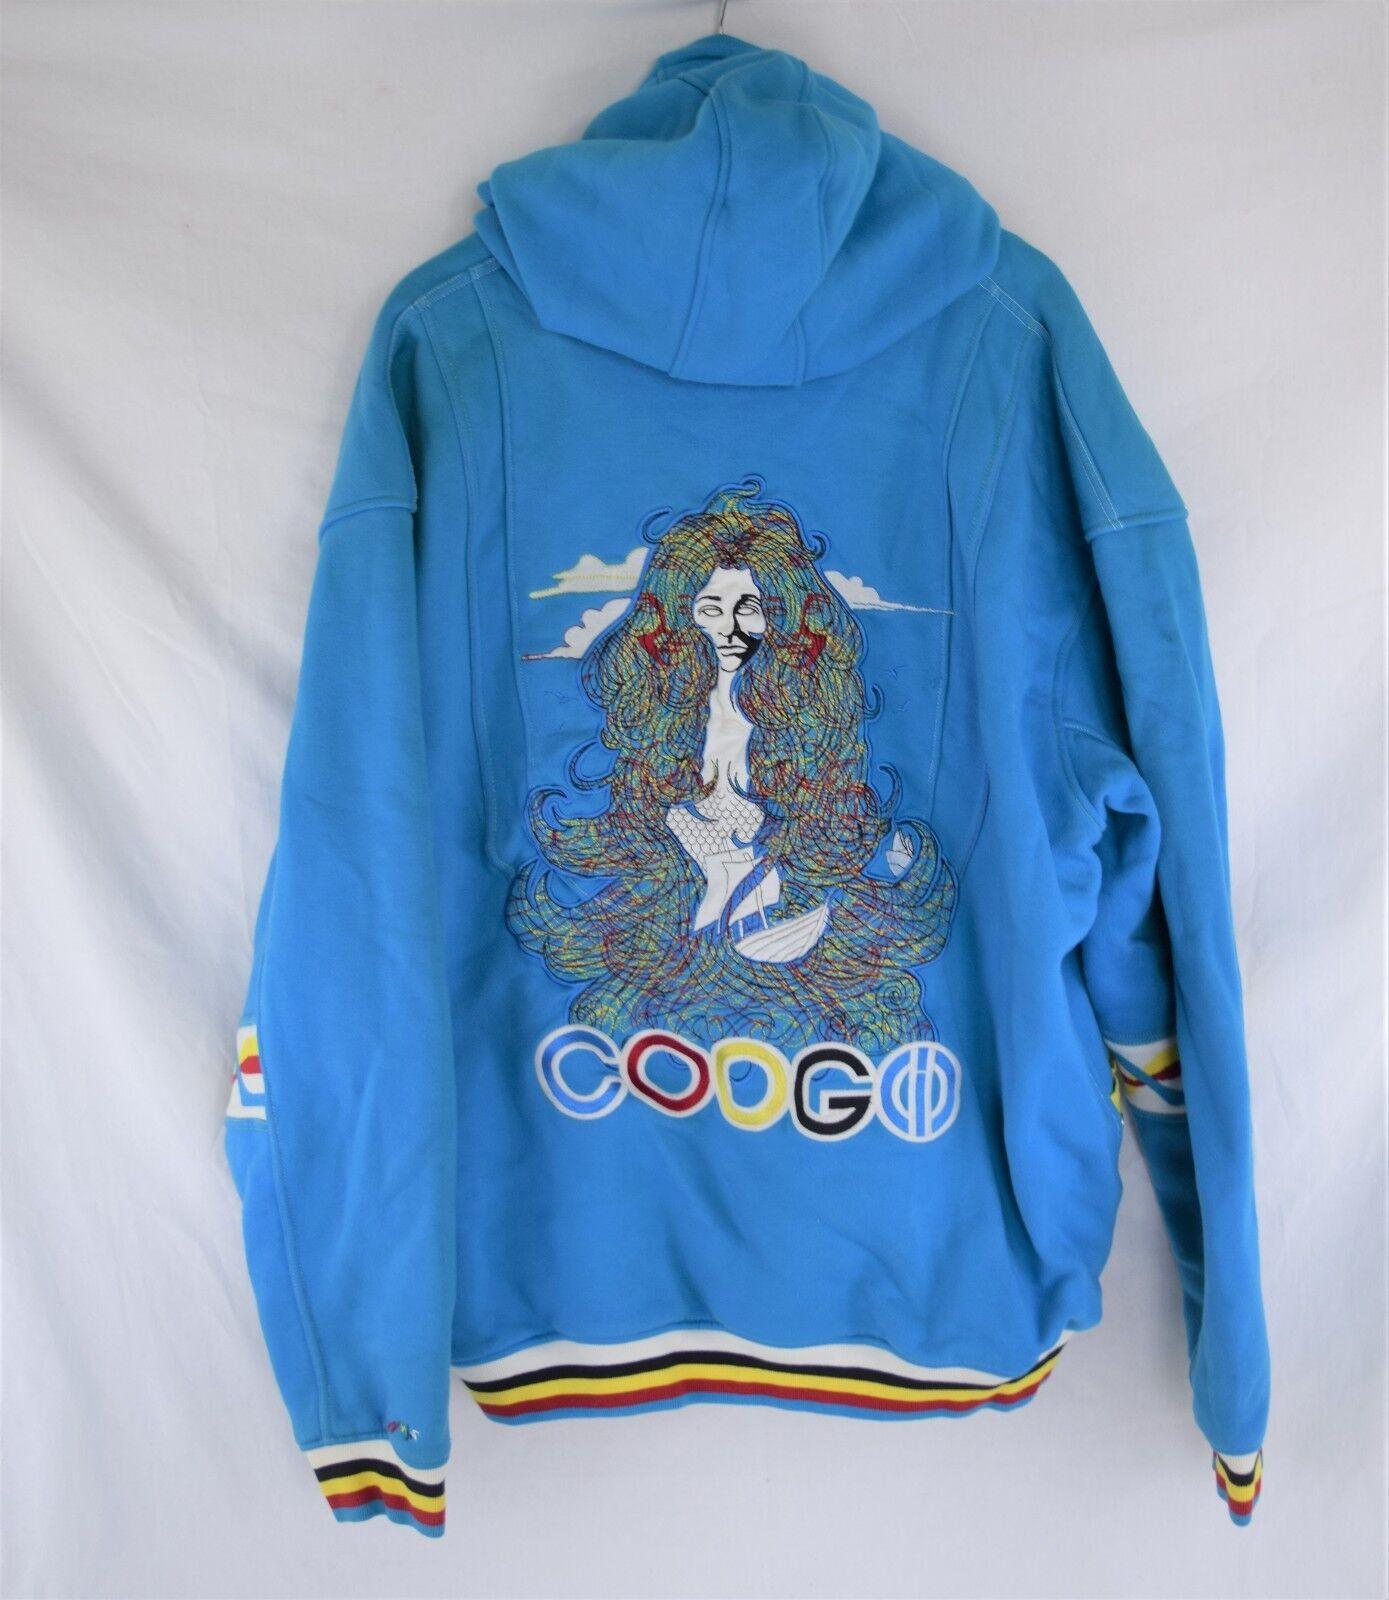 COOGI Hoodie Hooded Zip up Sweatshirt EmbroideROT Bright Teal Rare 4XL EUC